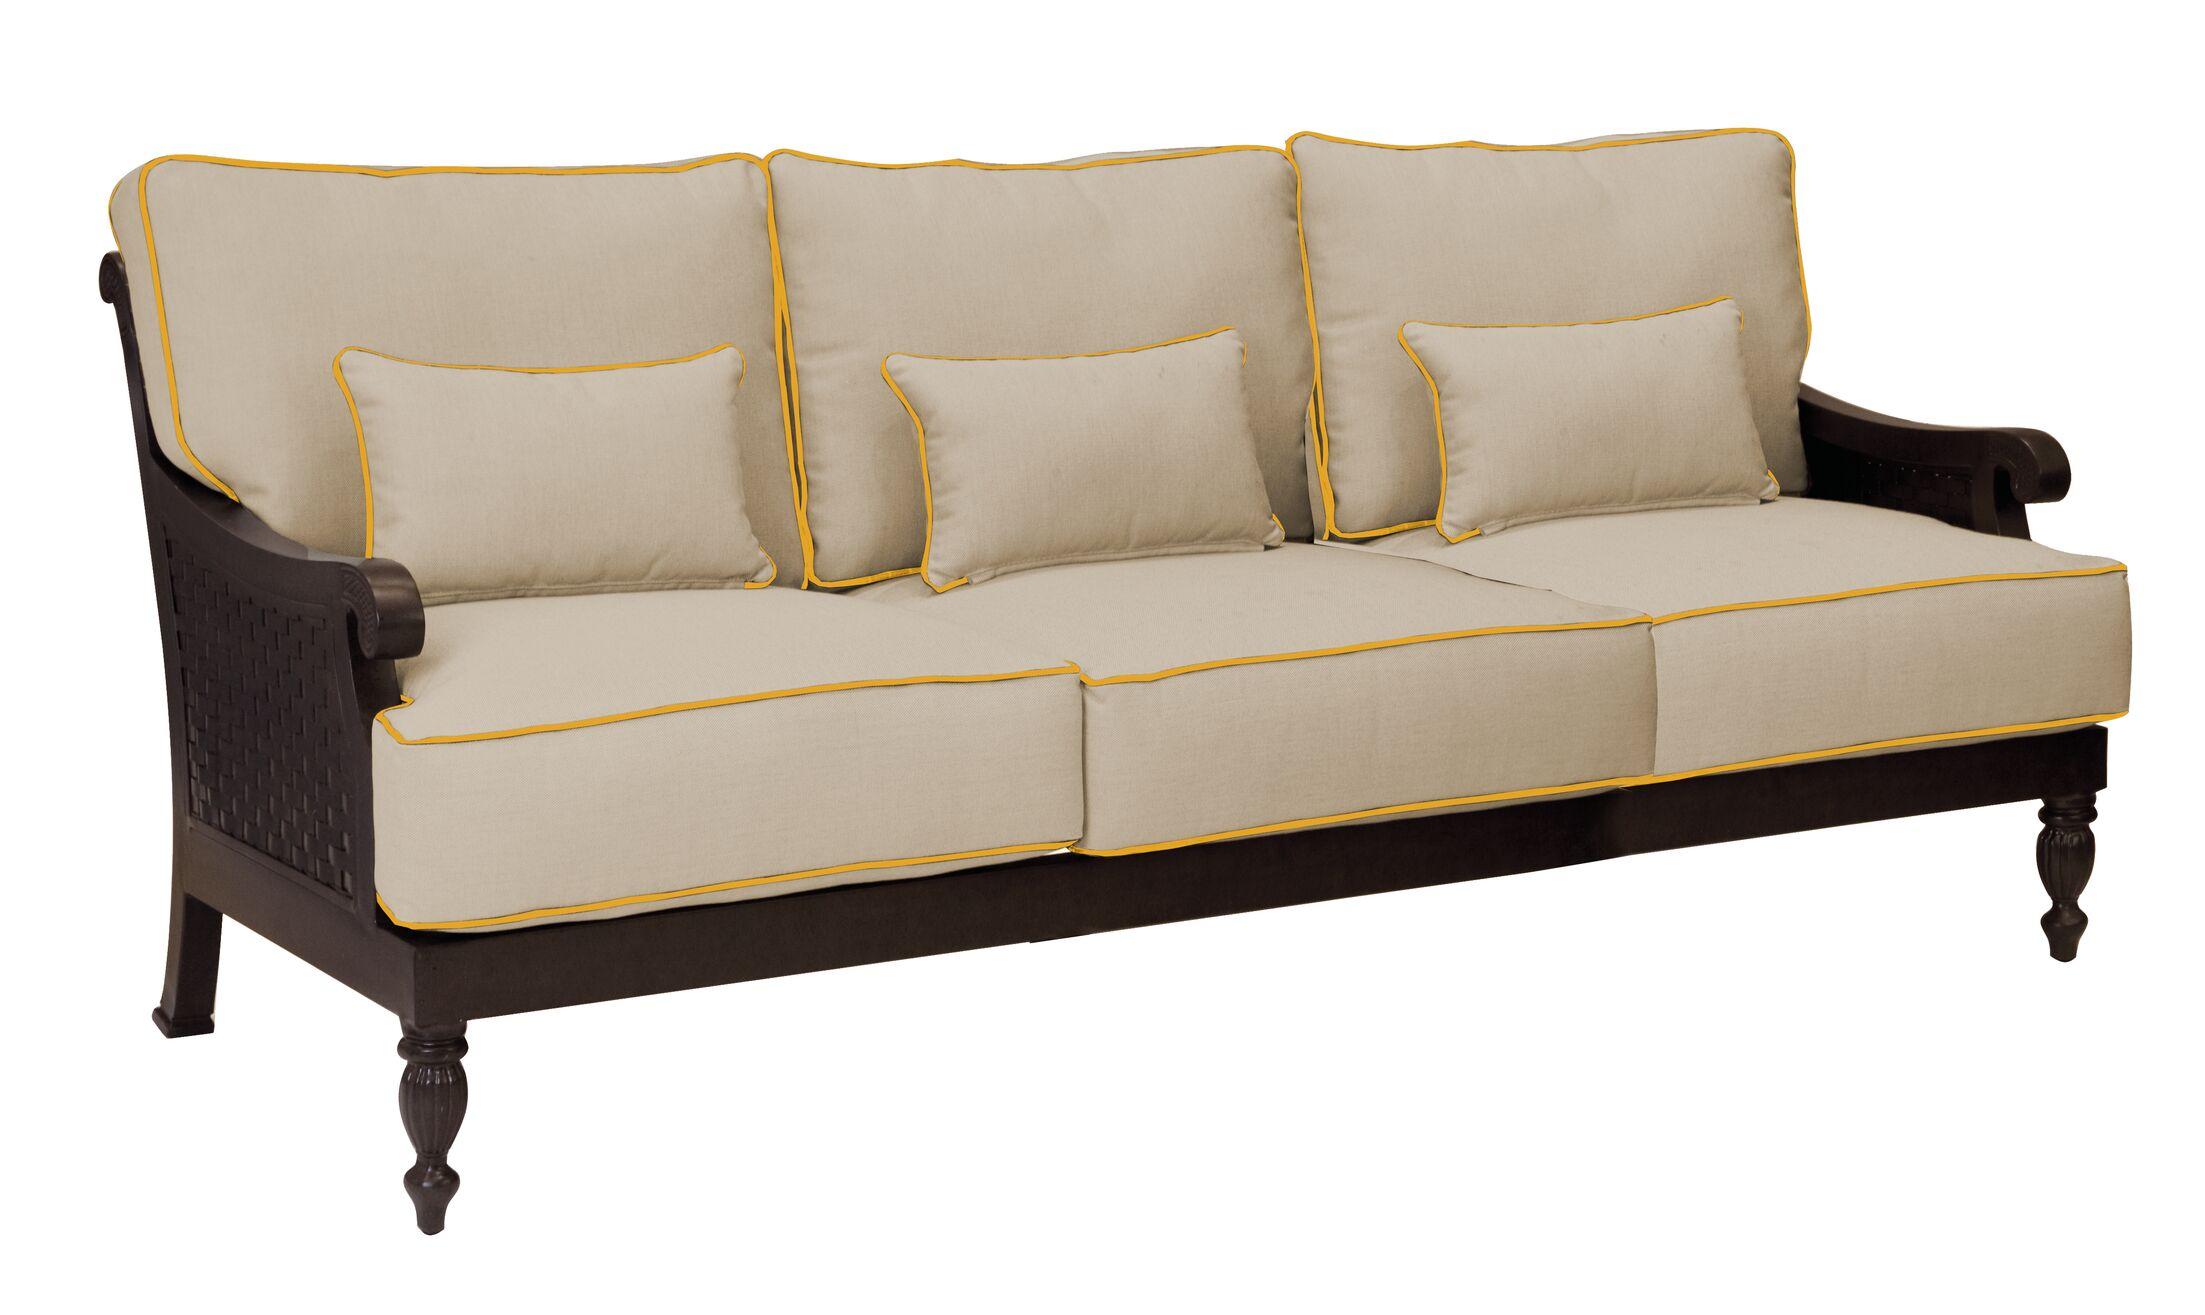 Jakarta Patio Sofa with Cushions